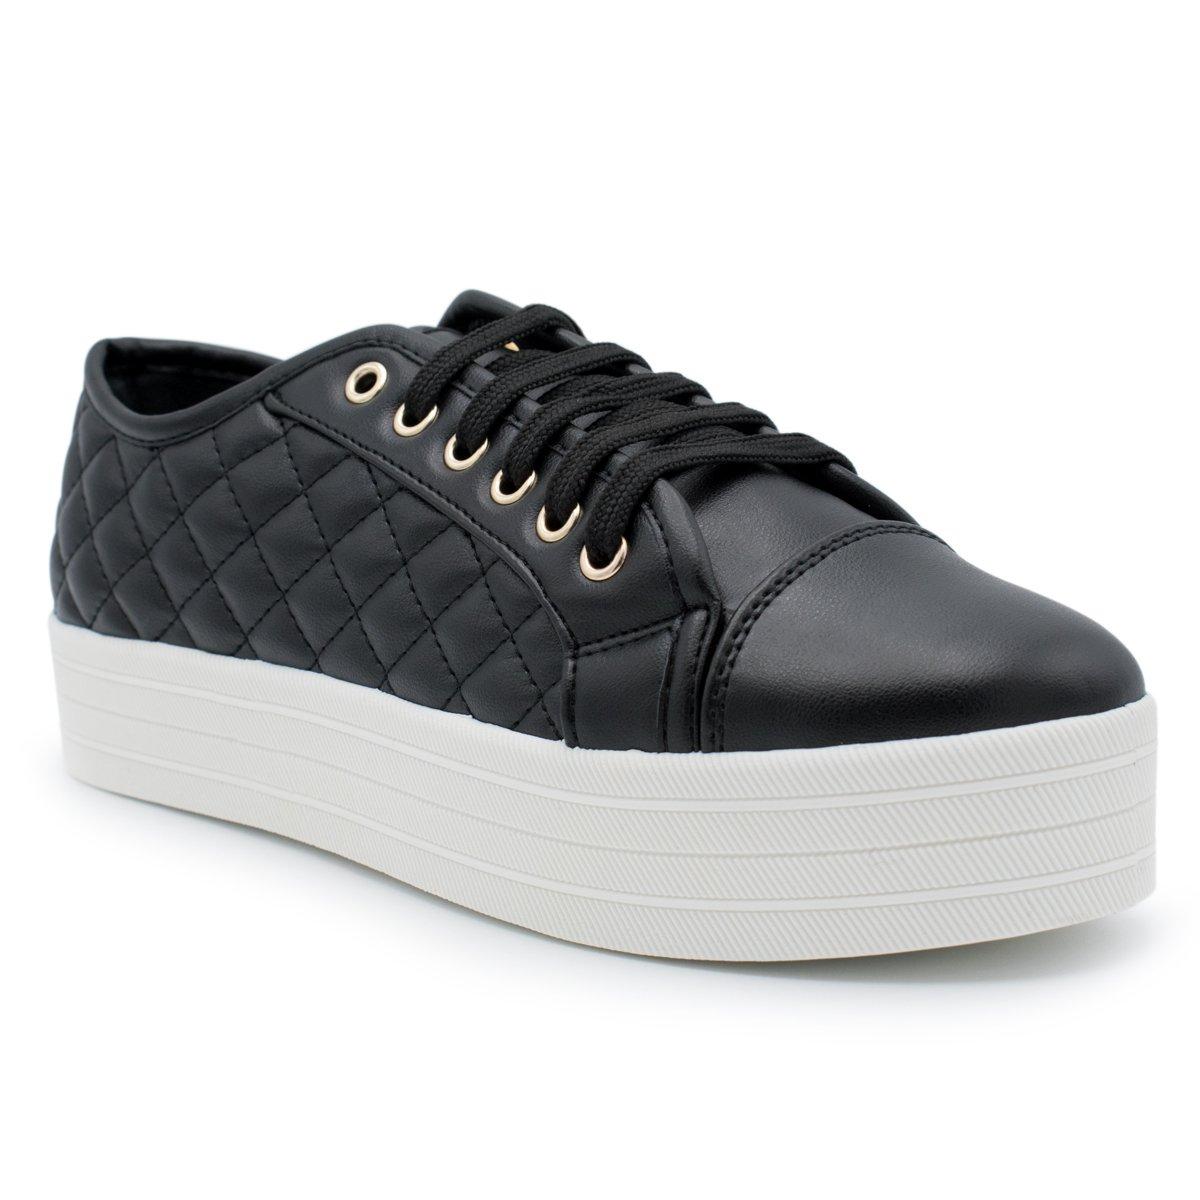 Breckelle's - Women's Soft Quilted Fashion Sneaker B071FQB2YM 7 B(M) US Black